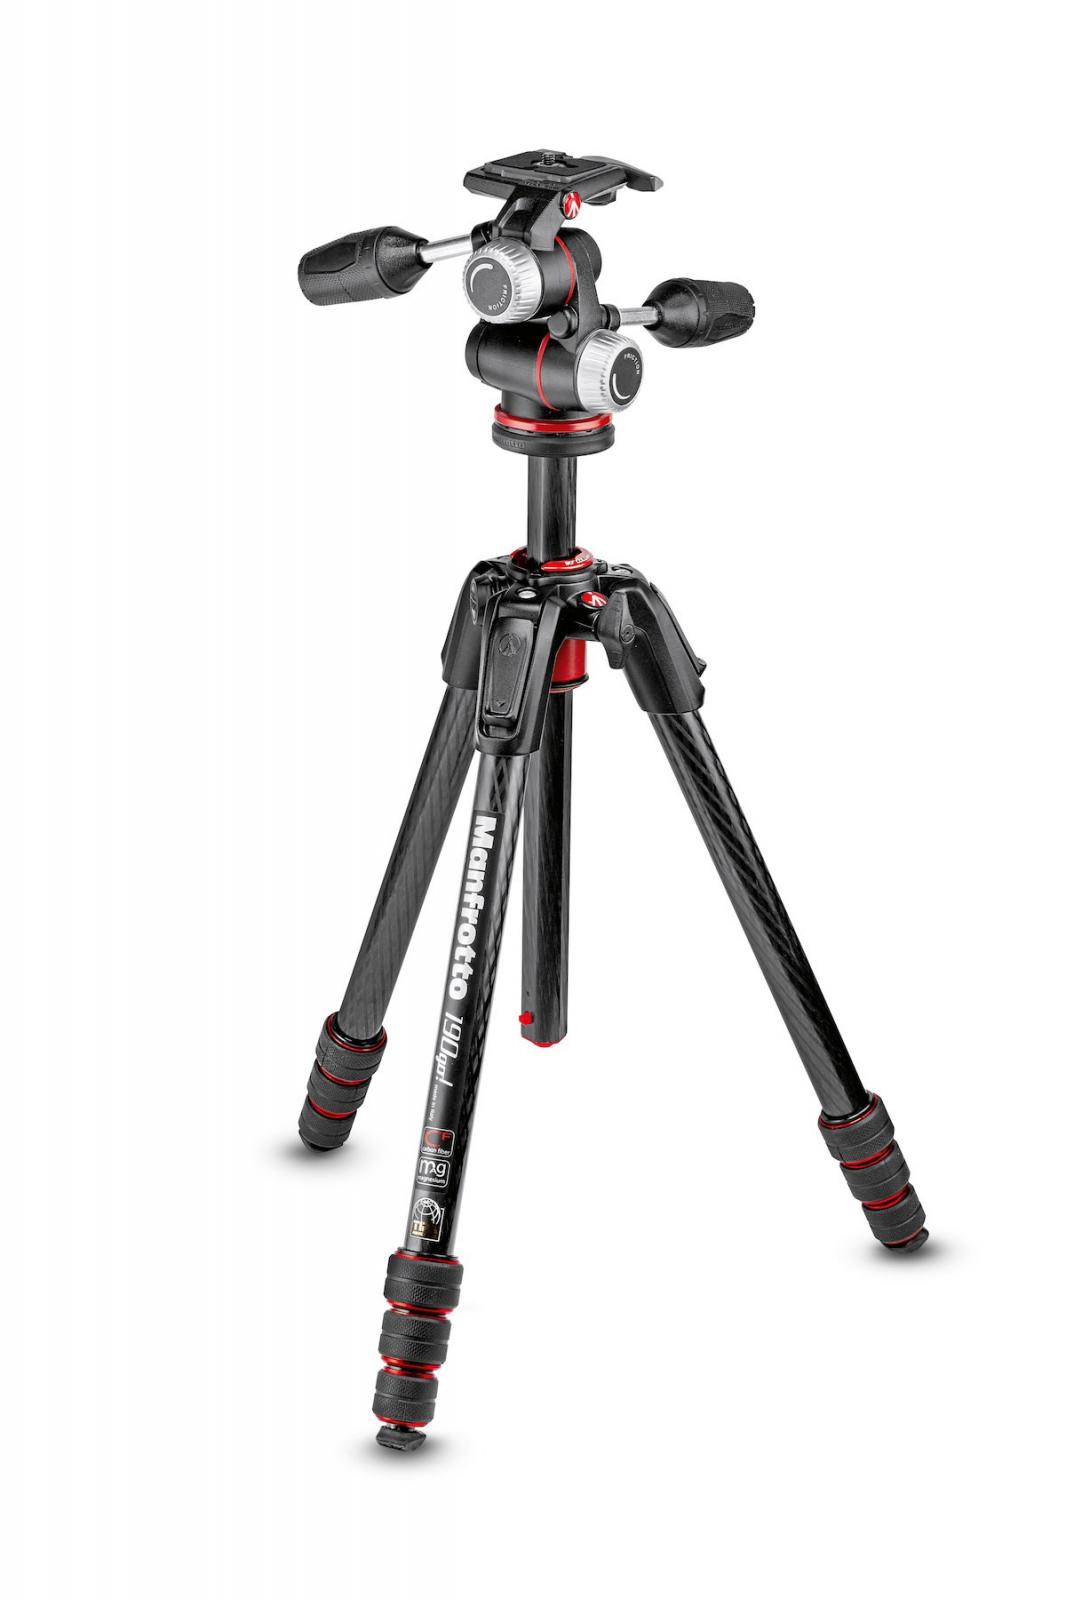 MK190GOC4-3WX imagine 2021